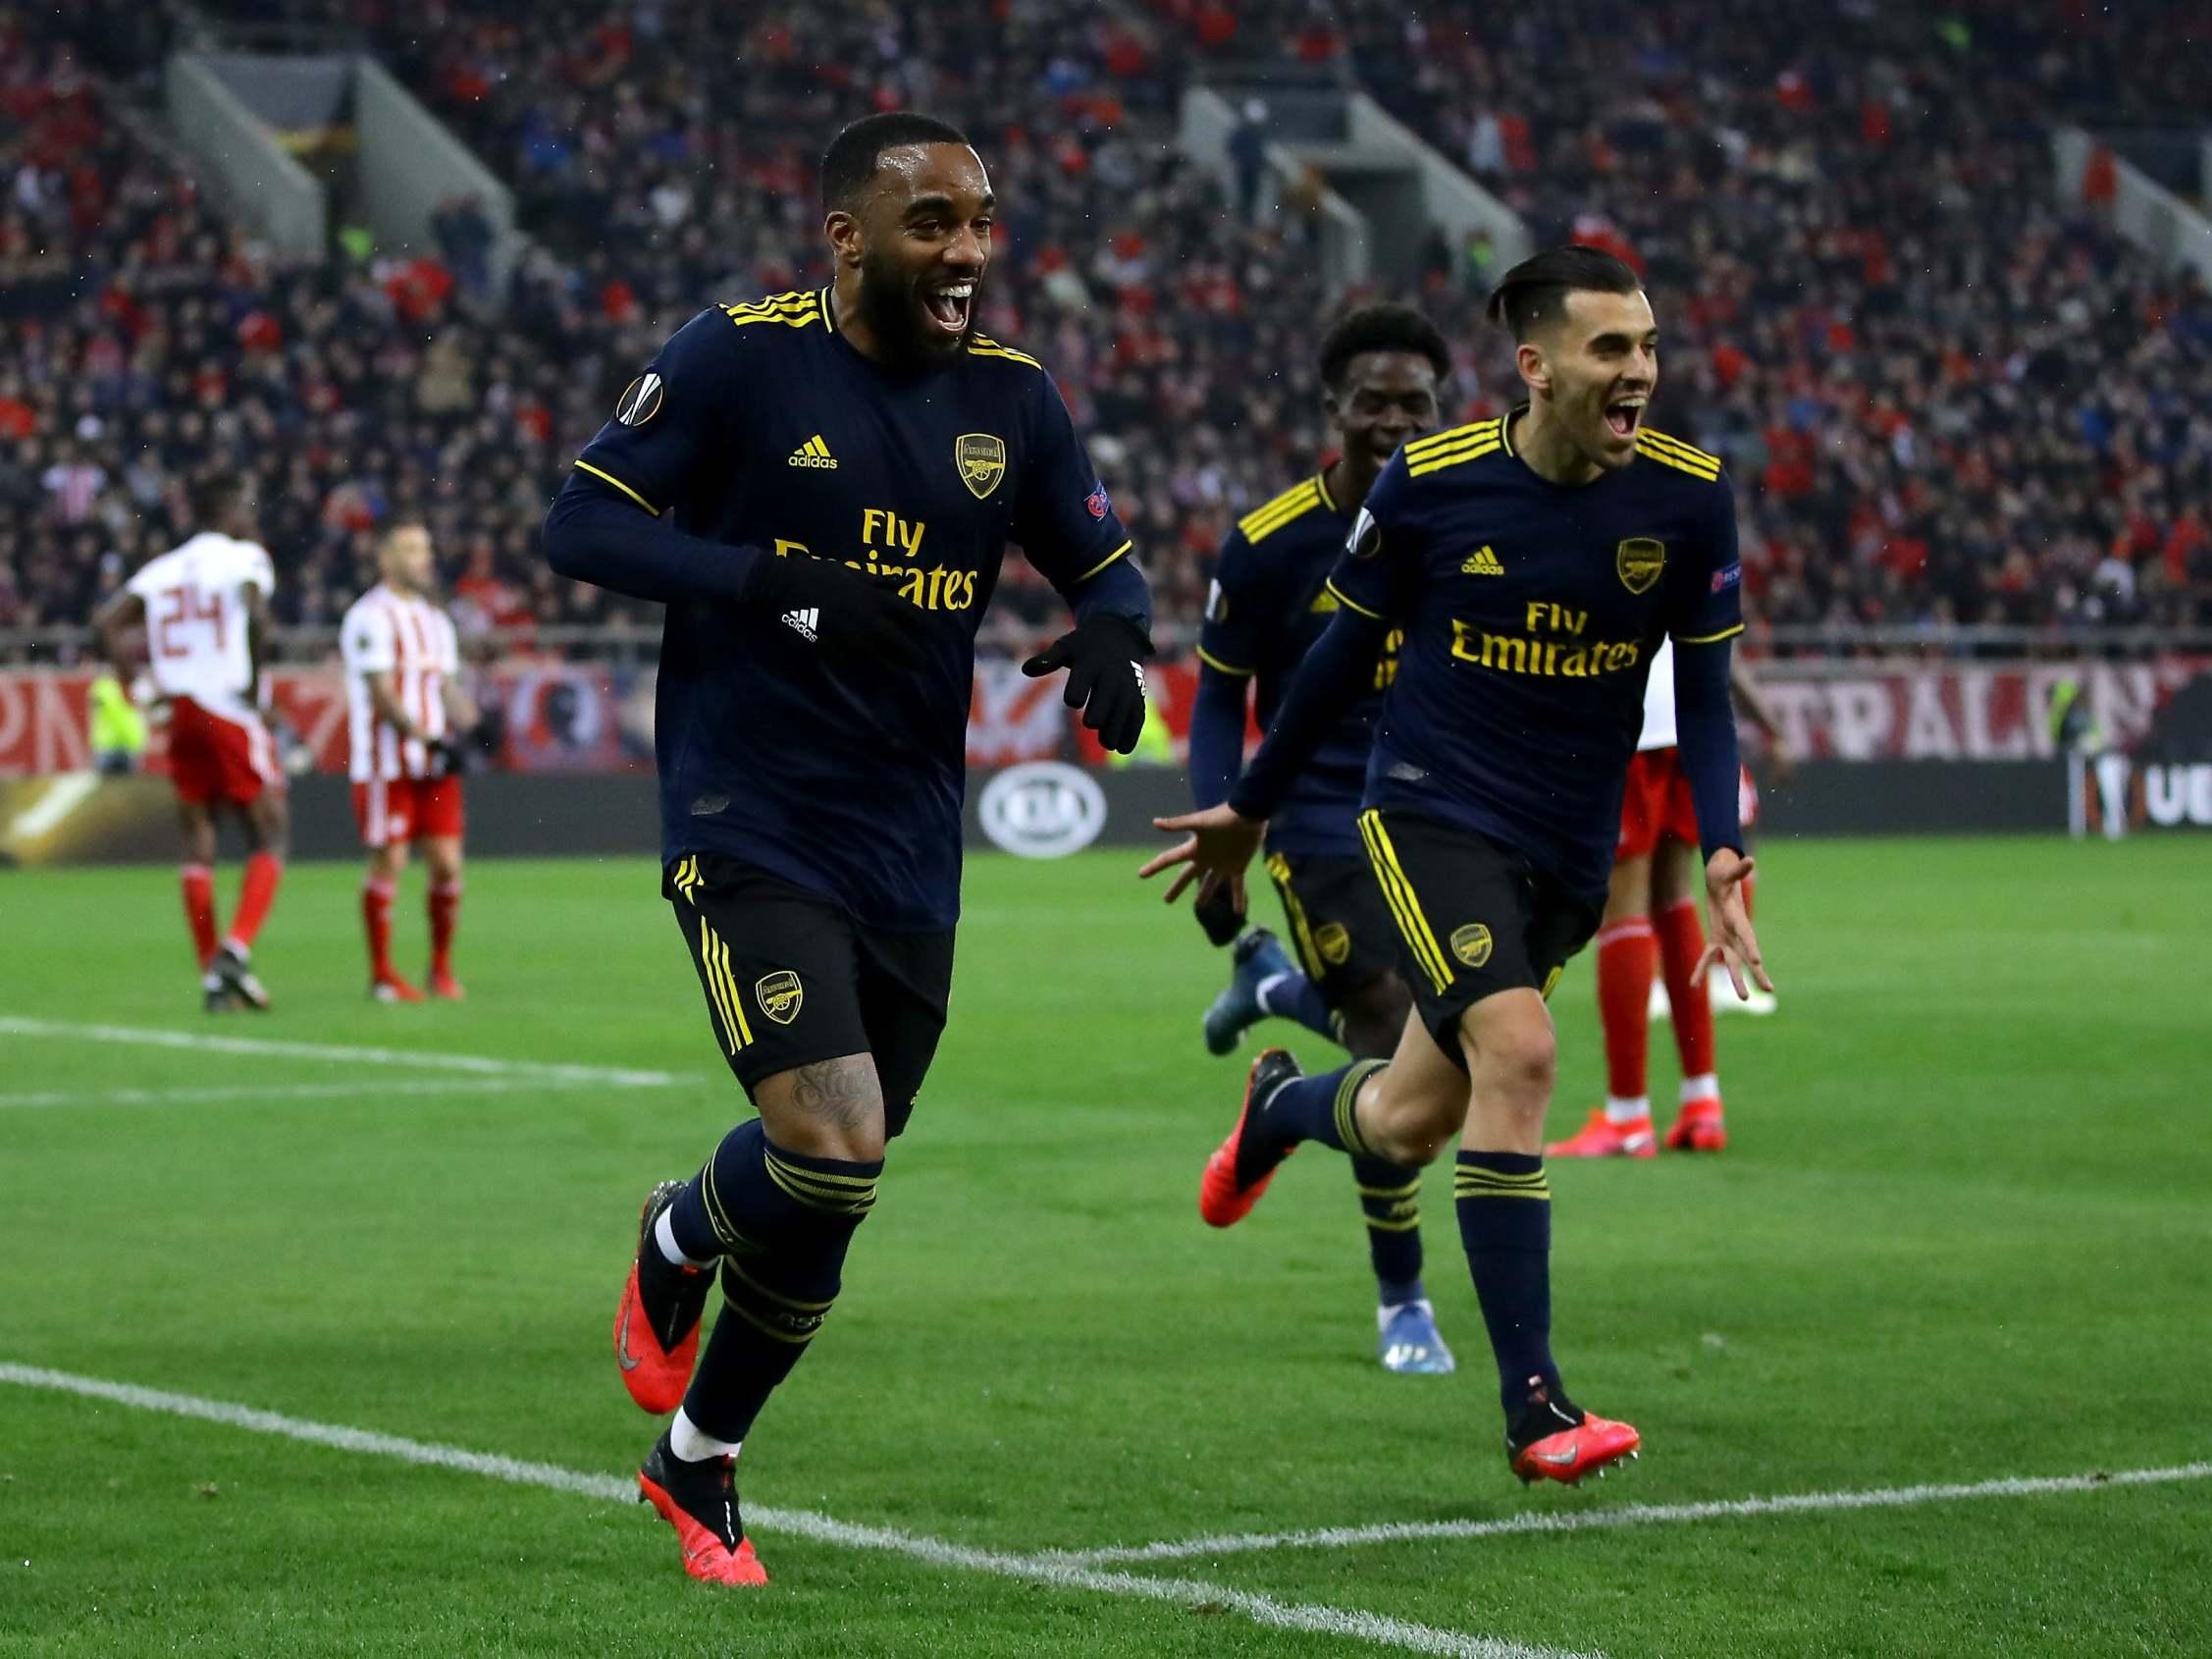 Olympiacos vs Arsenal LIVE – Latest updates